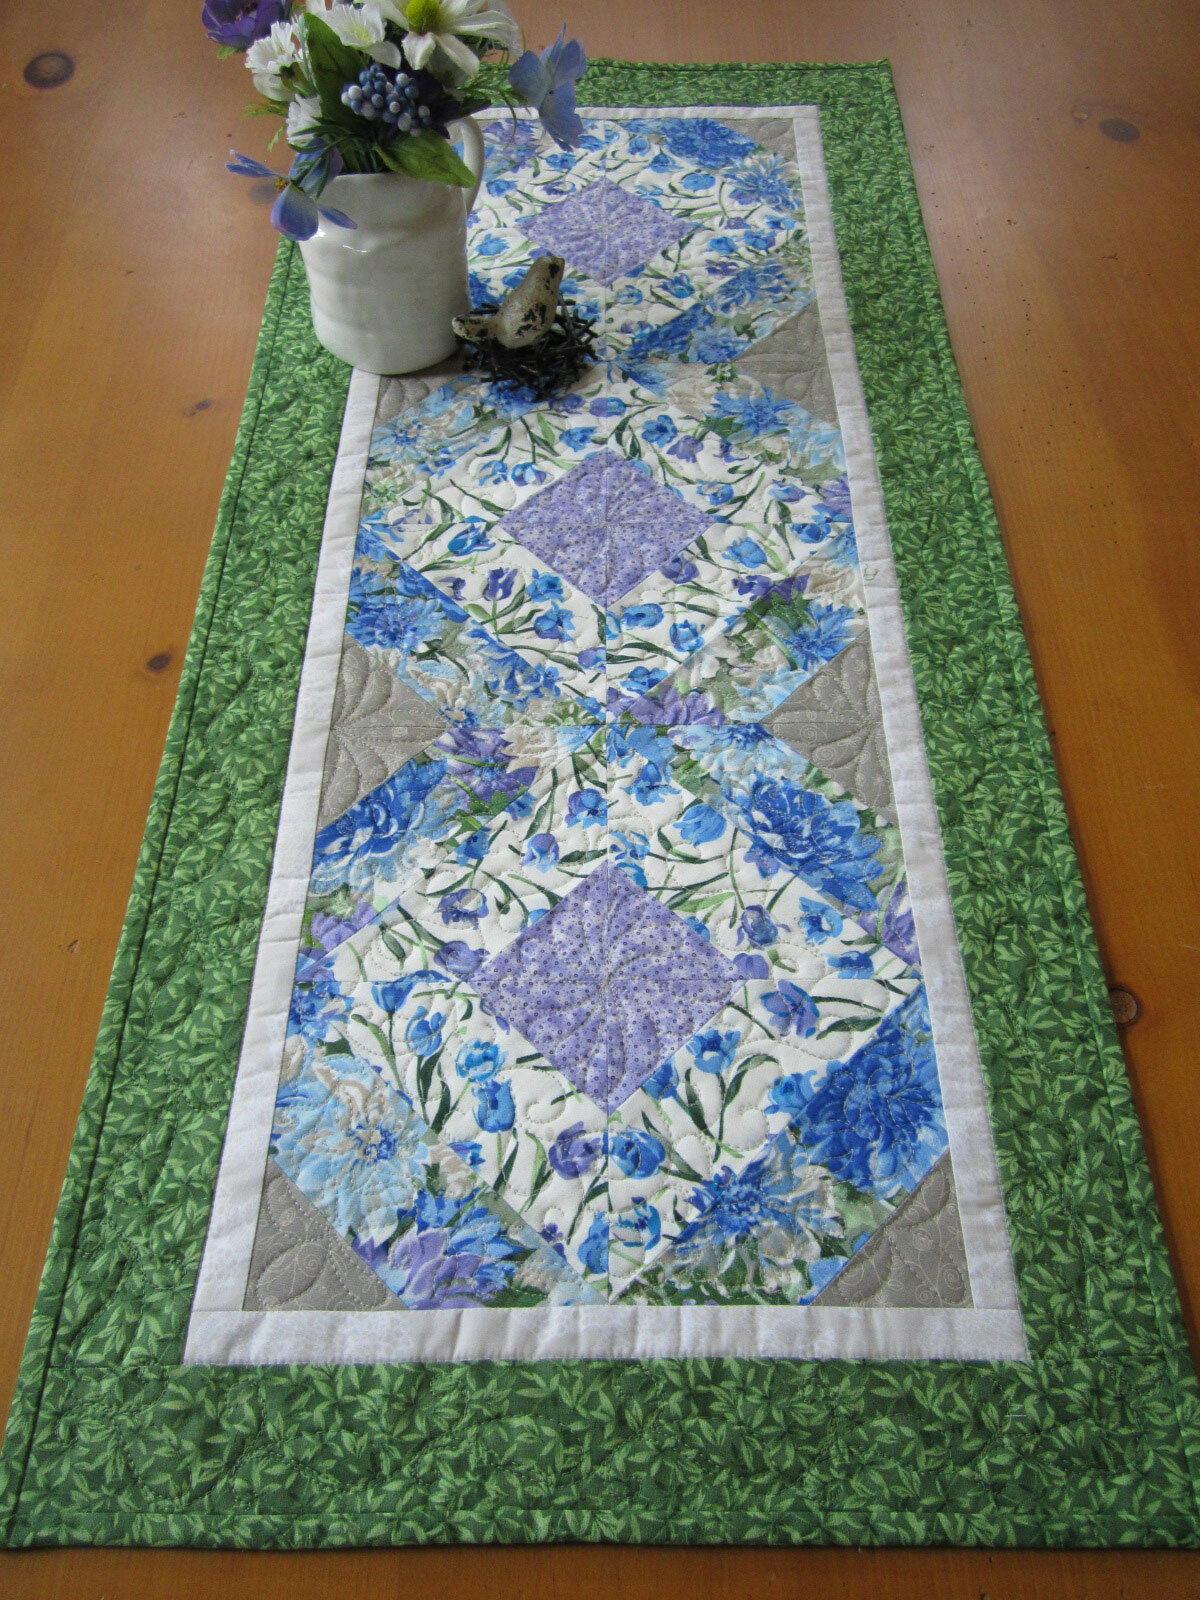 Spring Table Runner Floral Handmade Matelassé Coton Runner Paques